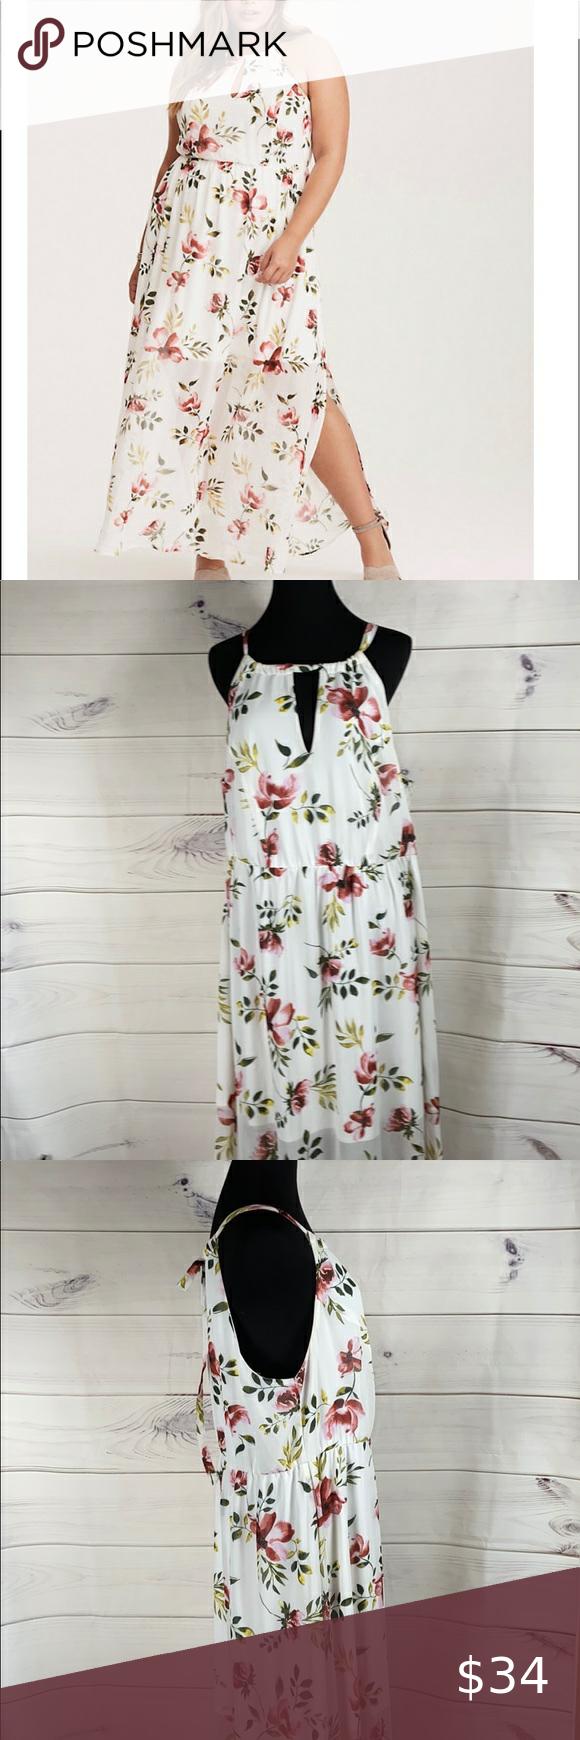 Torrid Floral Keyhole Cutaway Maxi Dress 2x Dresses 2x Maxi Dress Torrid Dresses [ 1740 x 580 Pixel ]